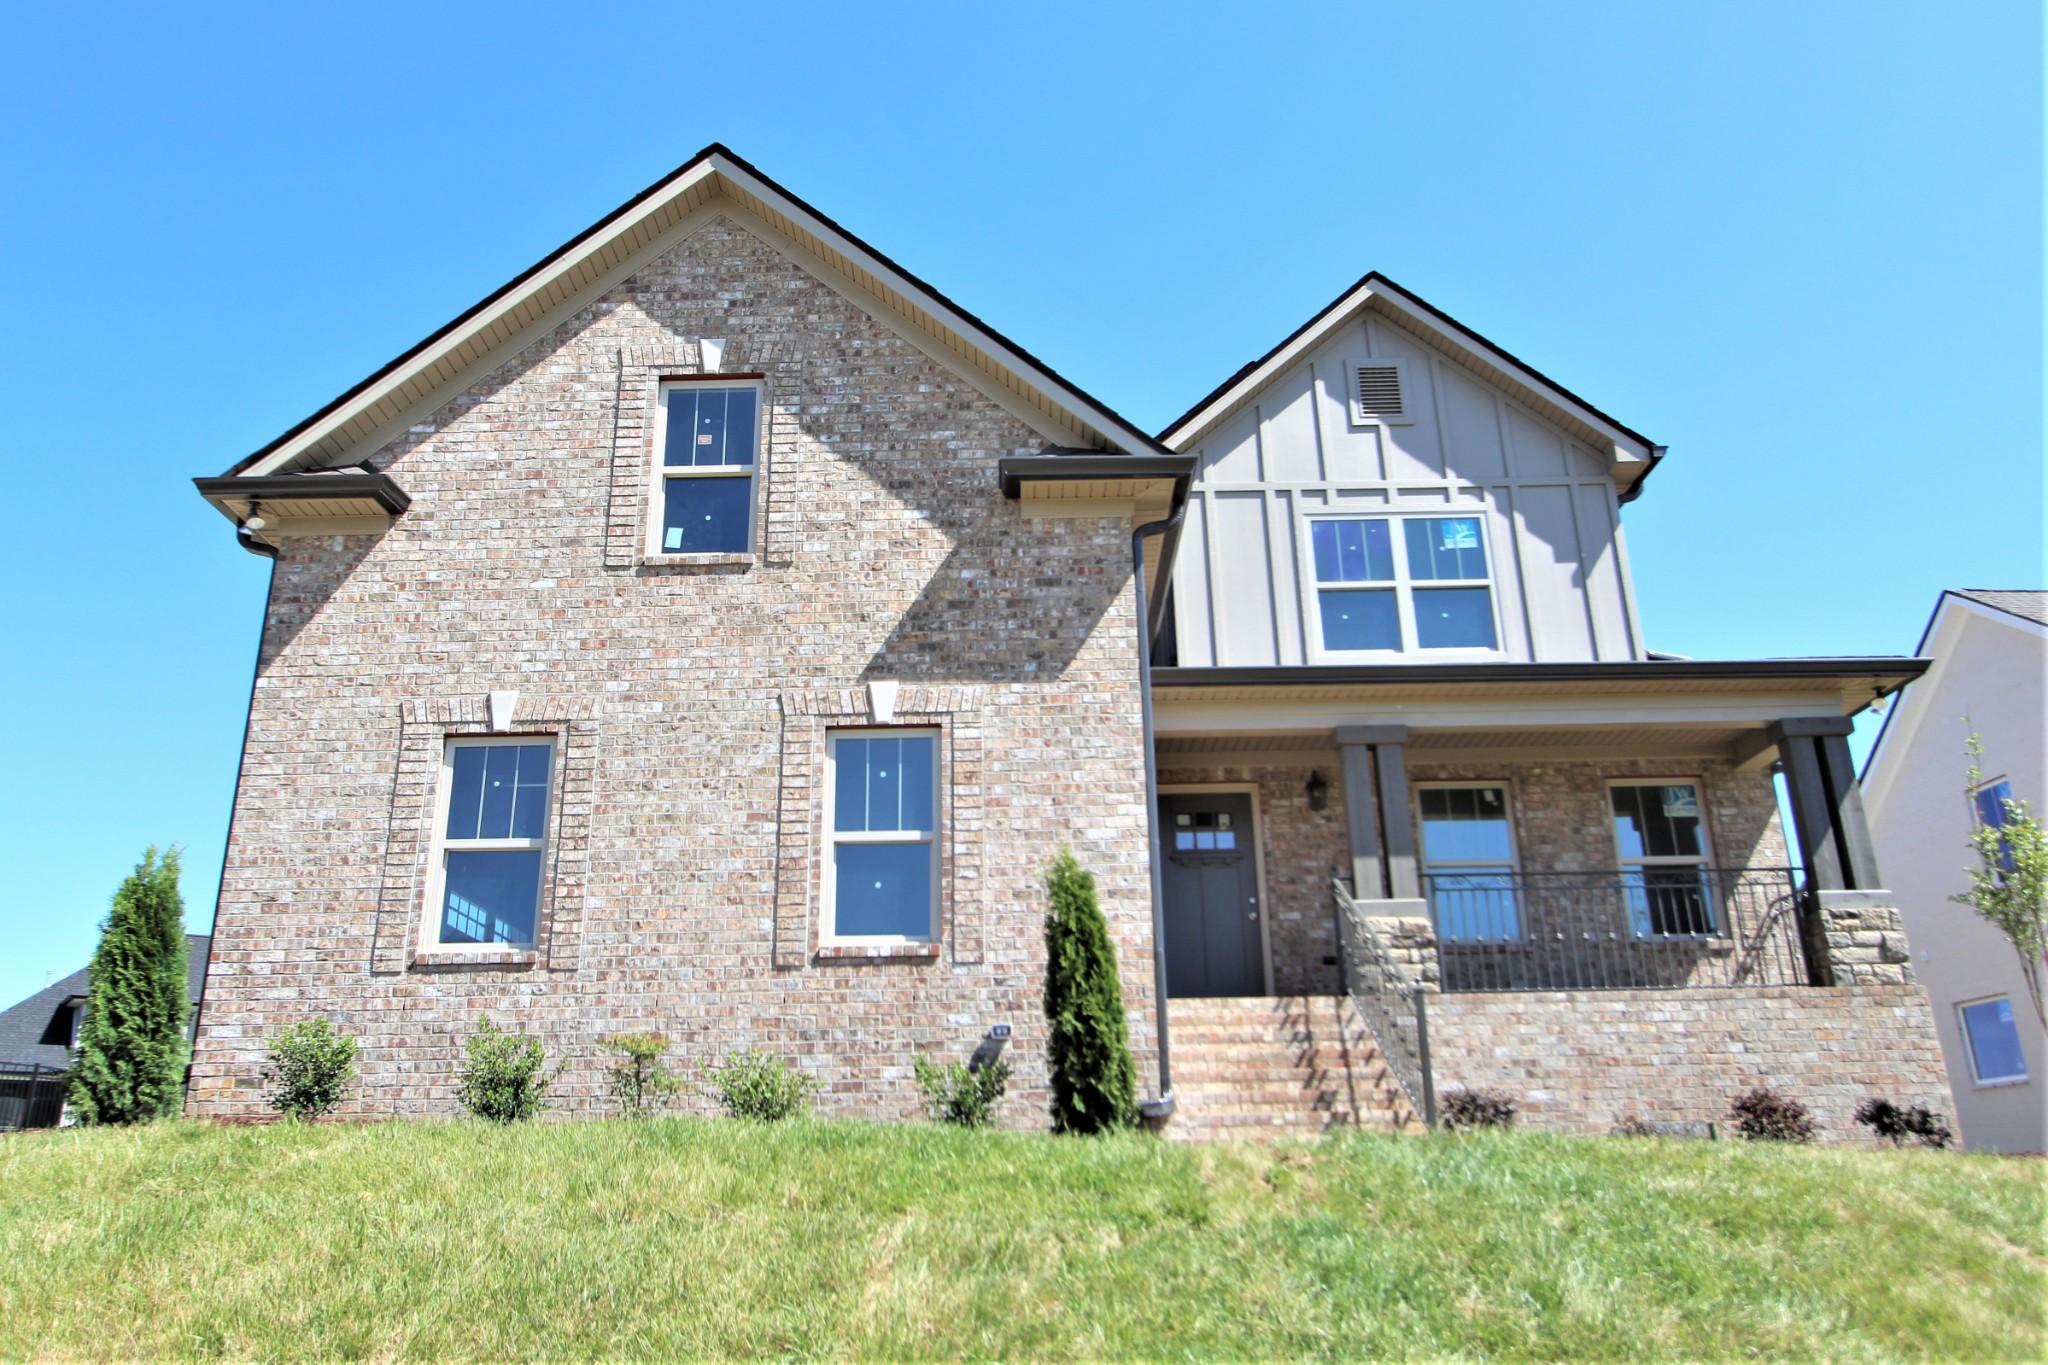 216 Ernest Drive #82, Lebanon, TN 37087 - Lebanon, TN real estate listing